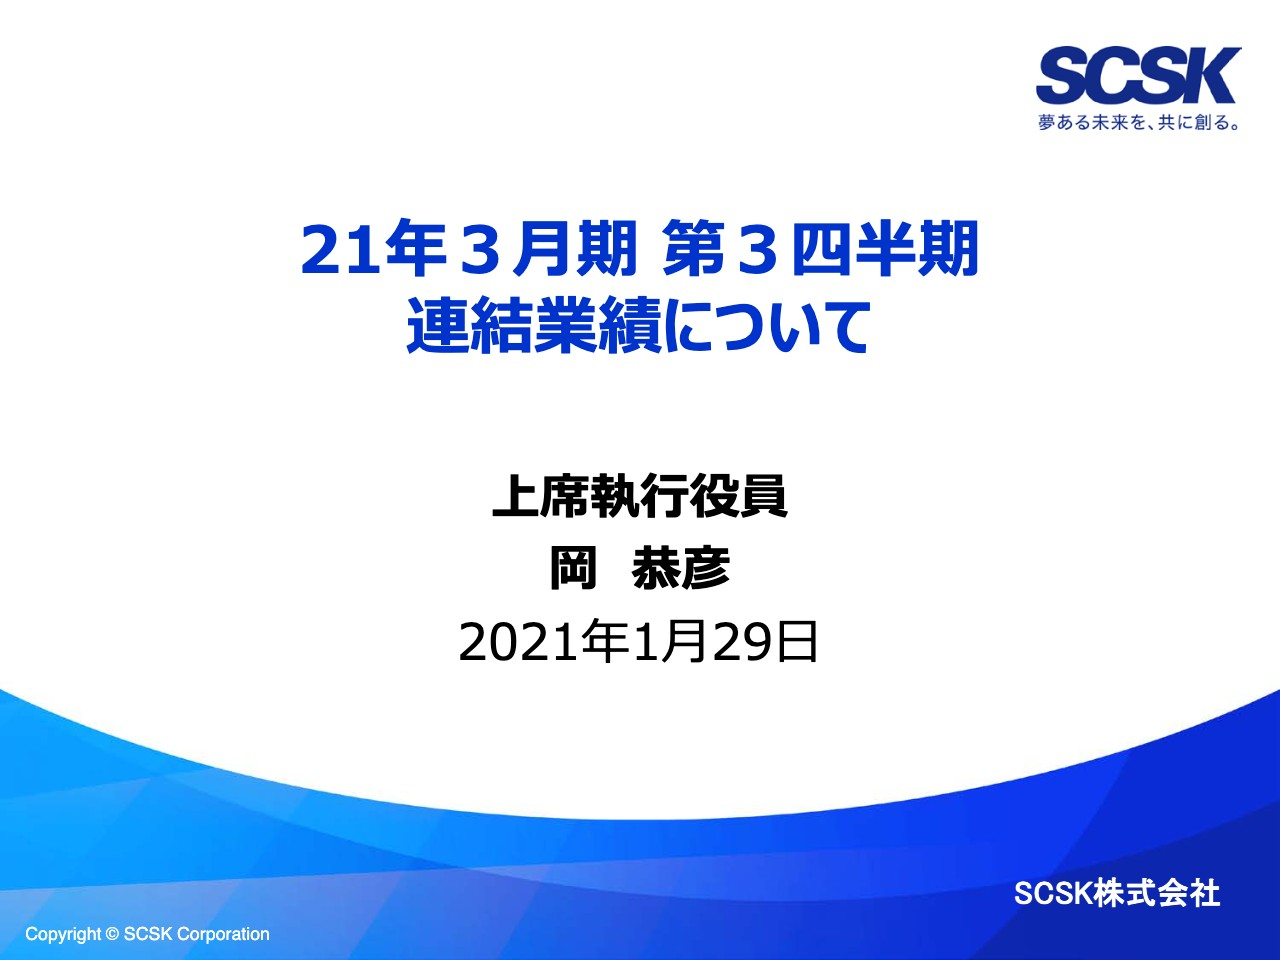 SCSK、3Qは増収増益 販管費の増加はあるもシステム開発、保守運用・サービスが好調に推移